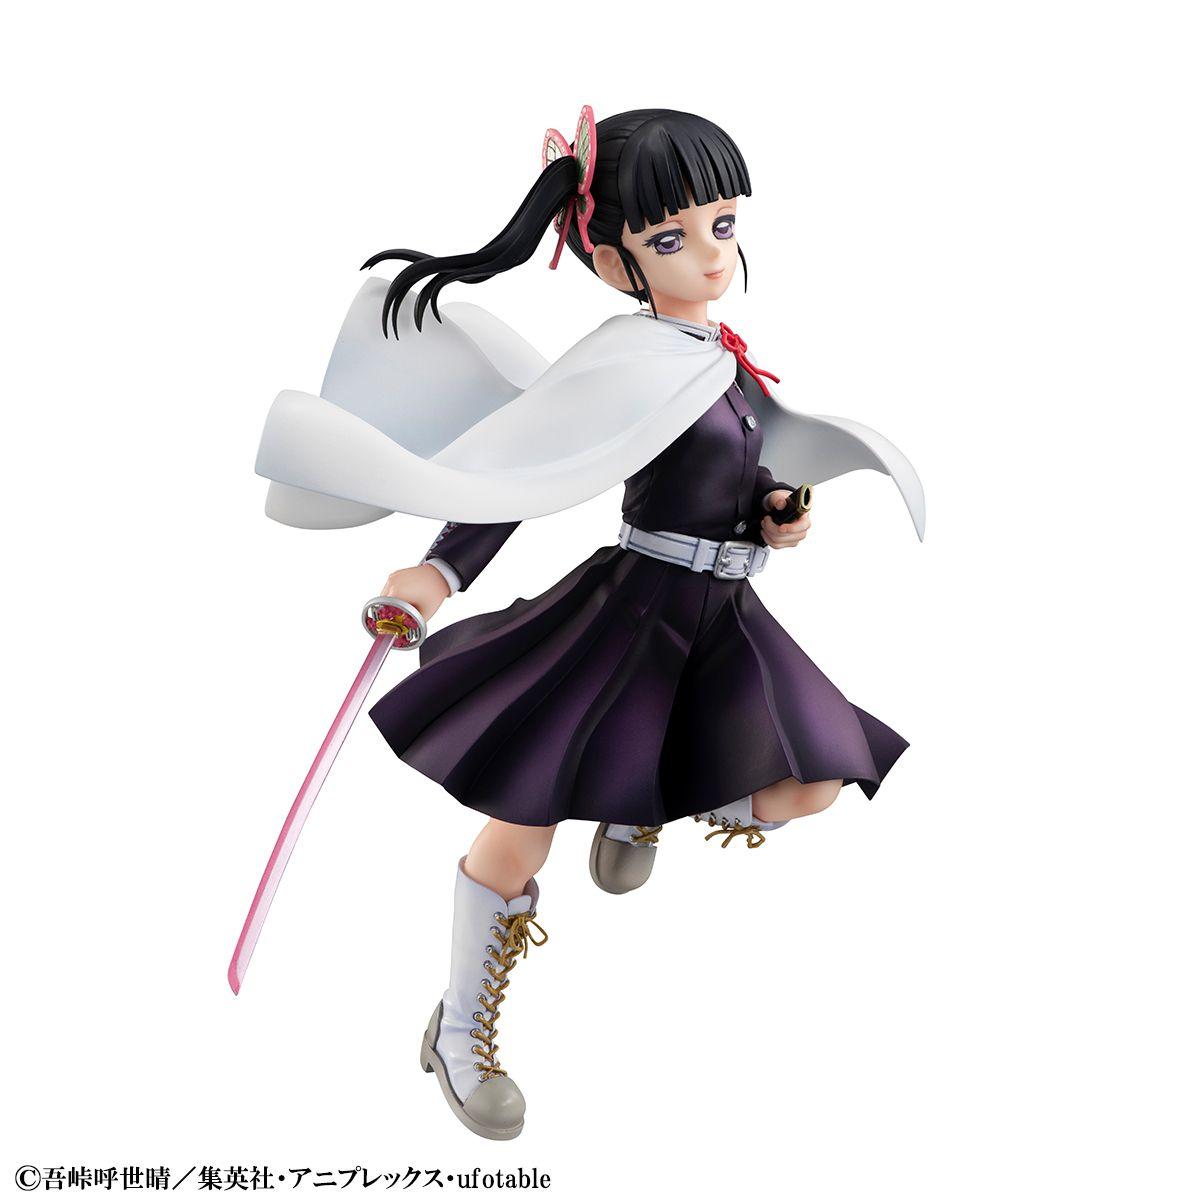 Kanao_2 - Figura semanal - (3-16-5-2021) - Hanami Dango